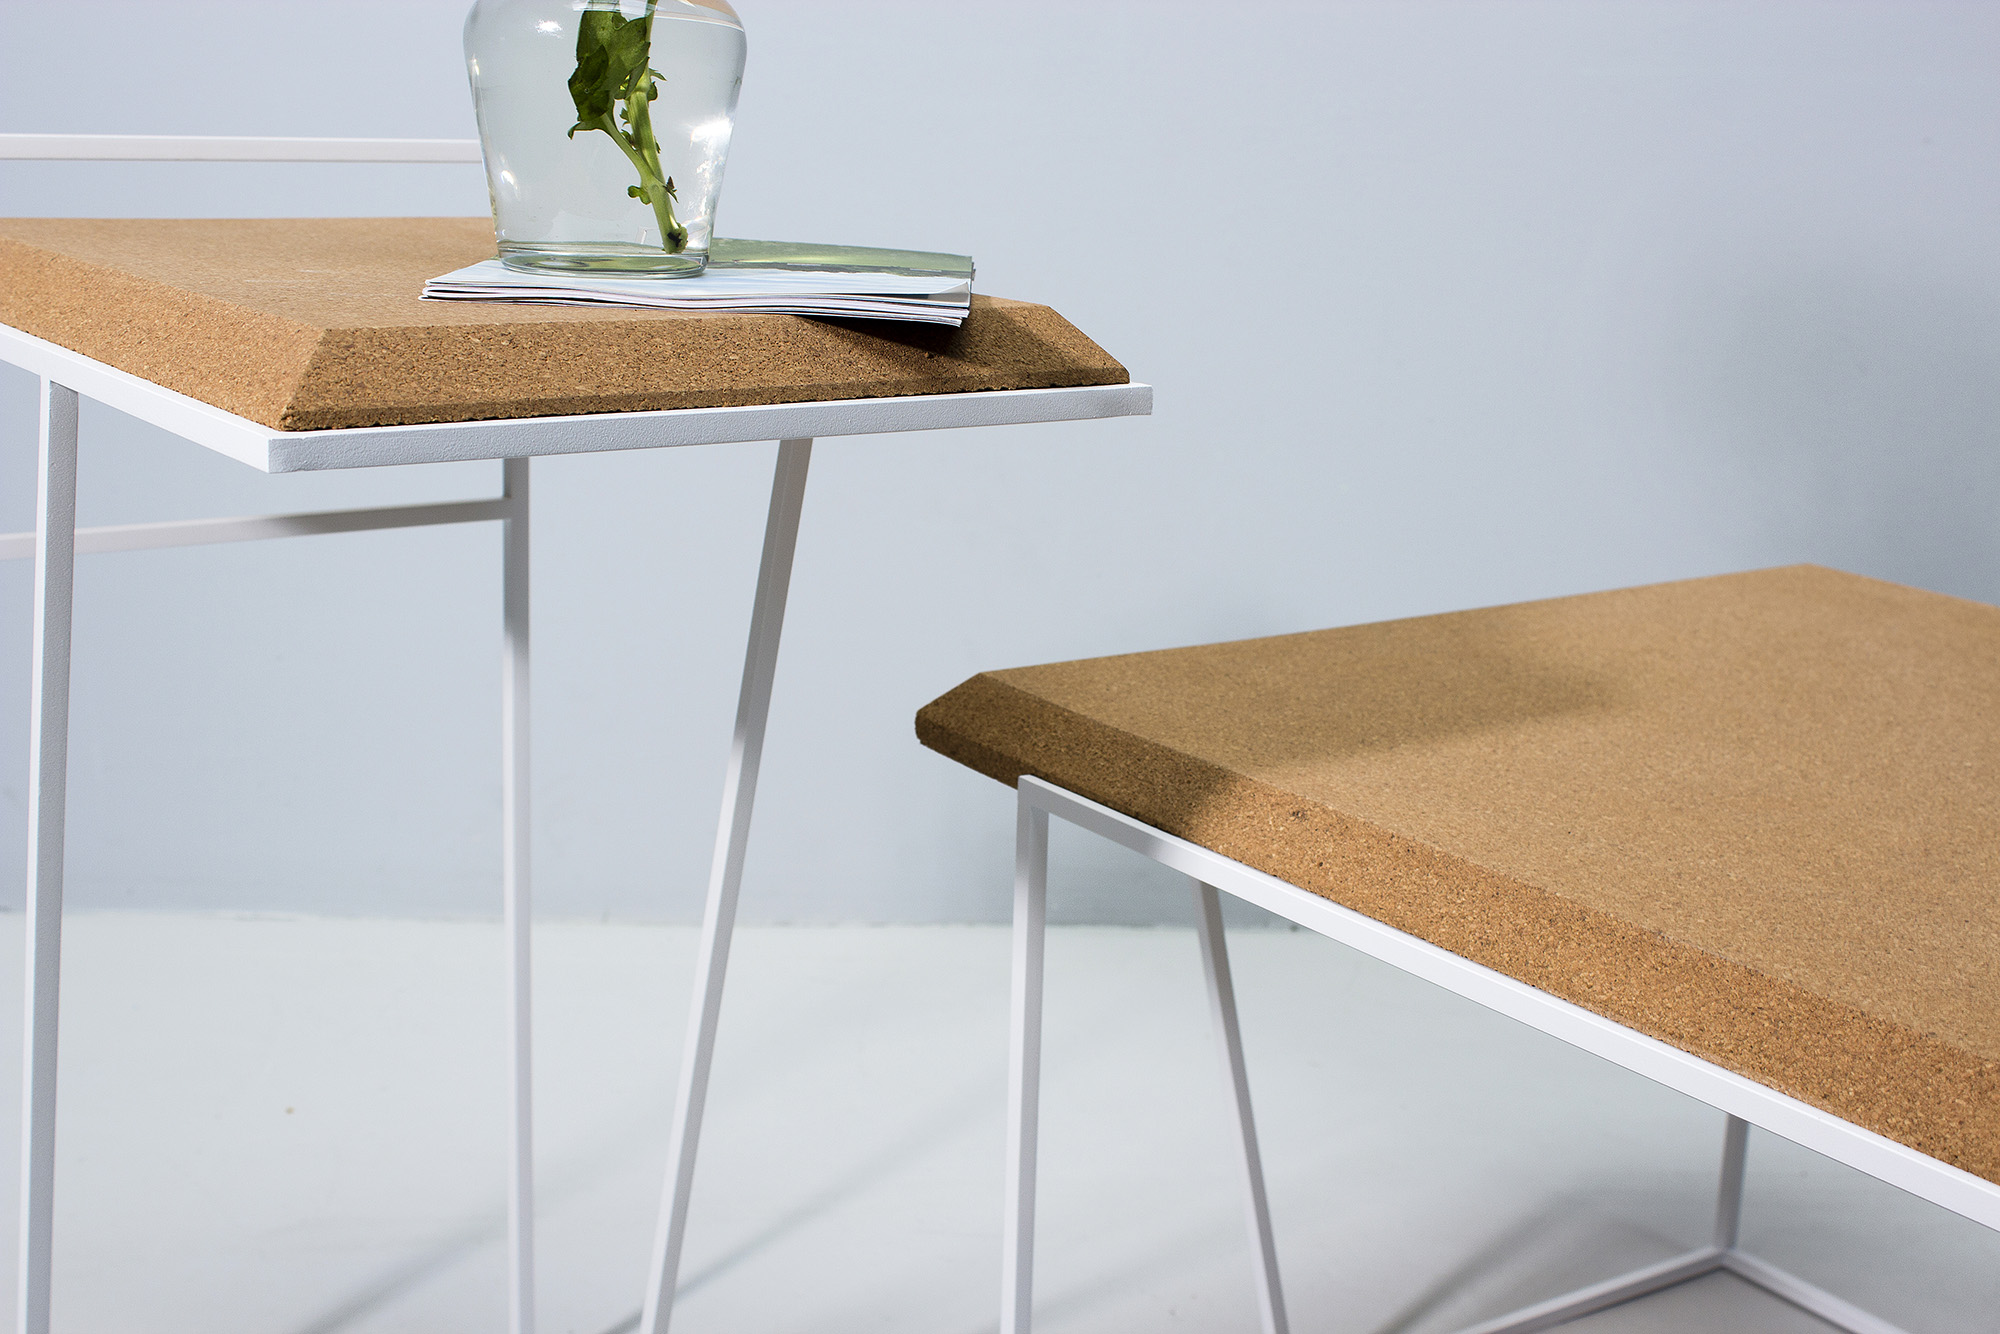 galula-grao-side-table-light-cork-white-amb-2.jpg